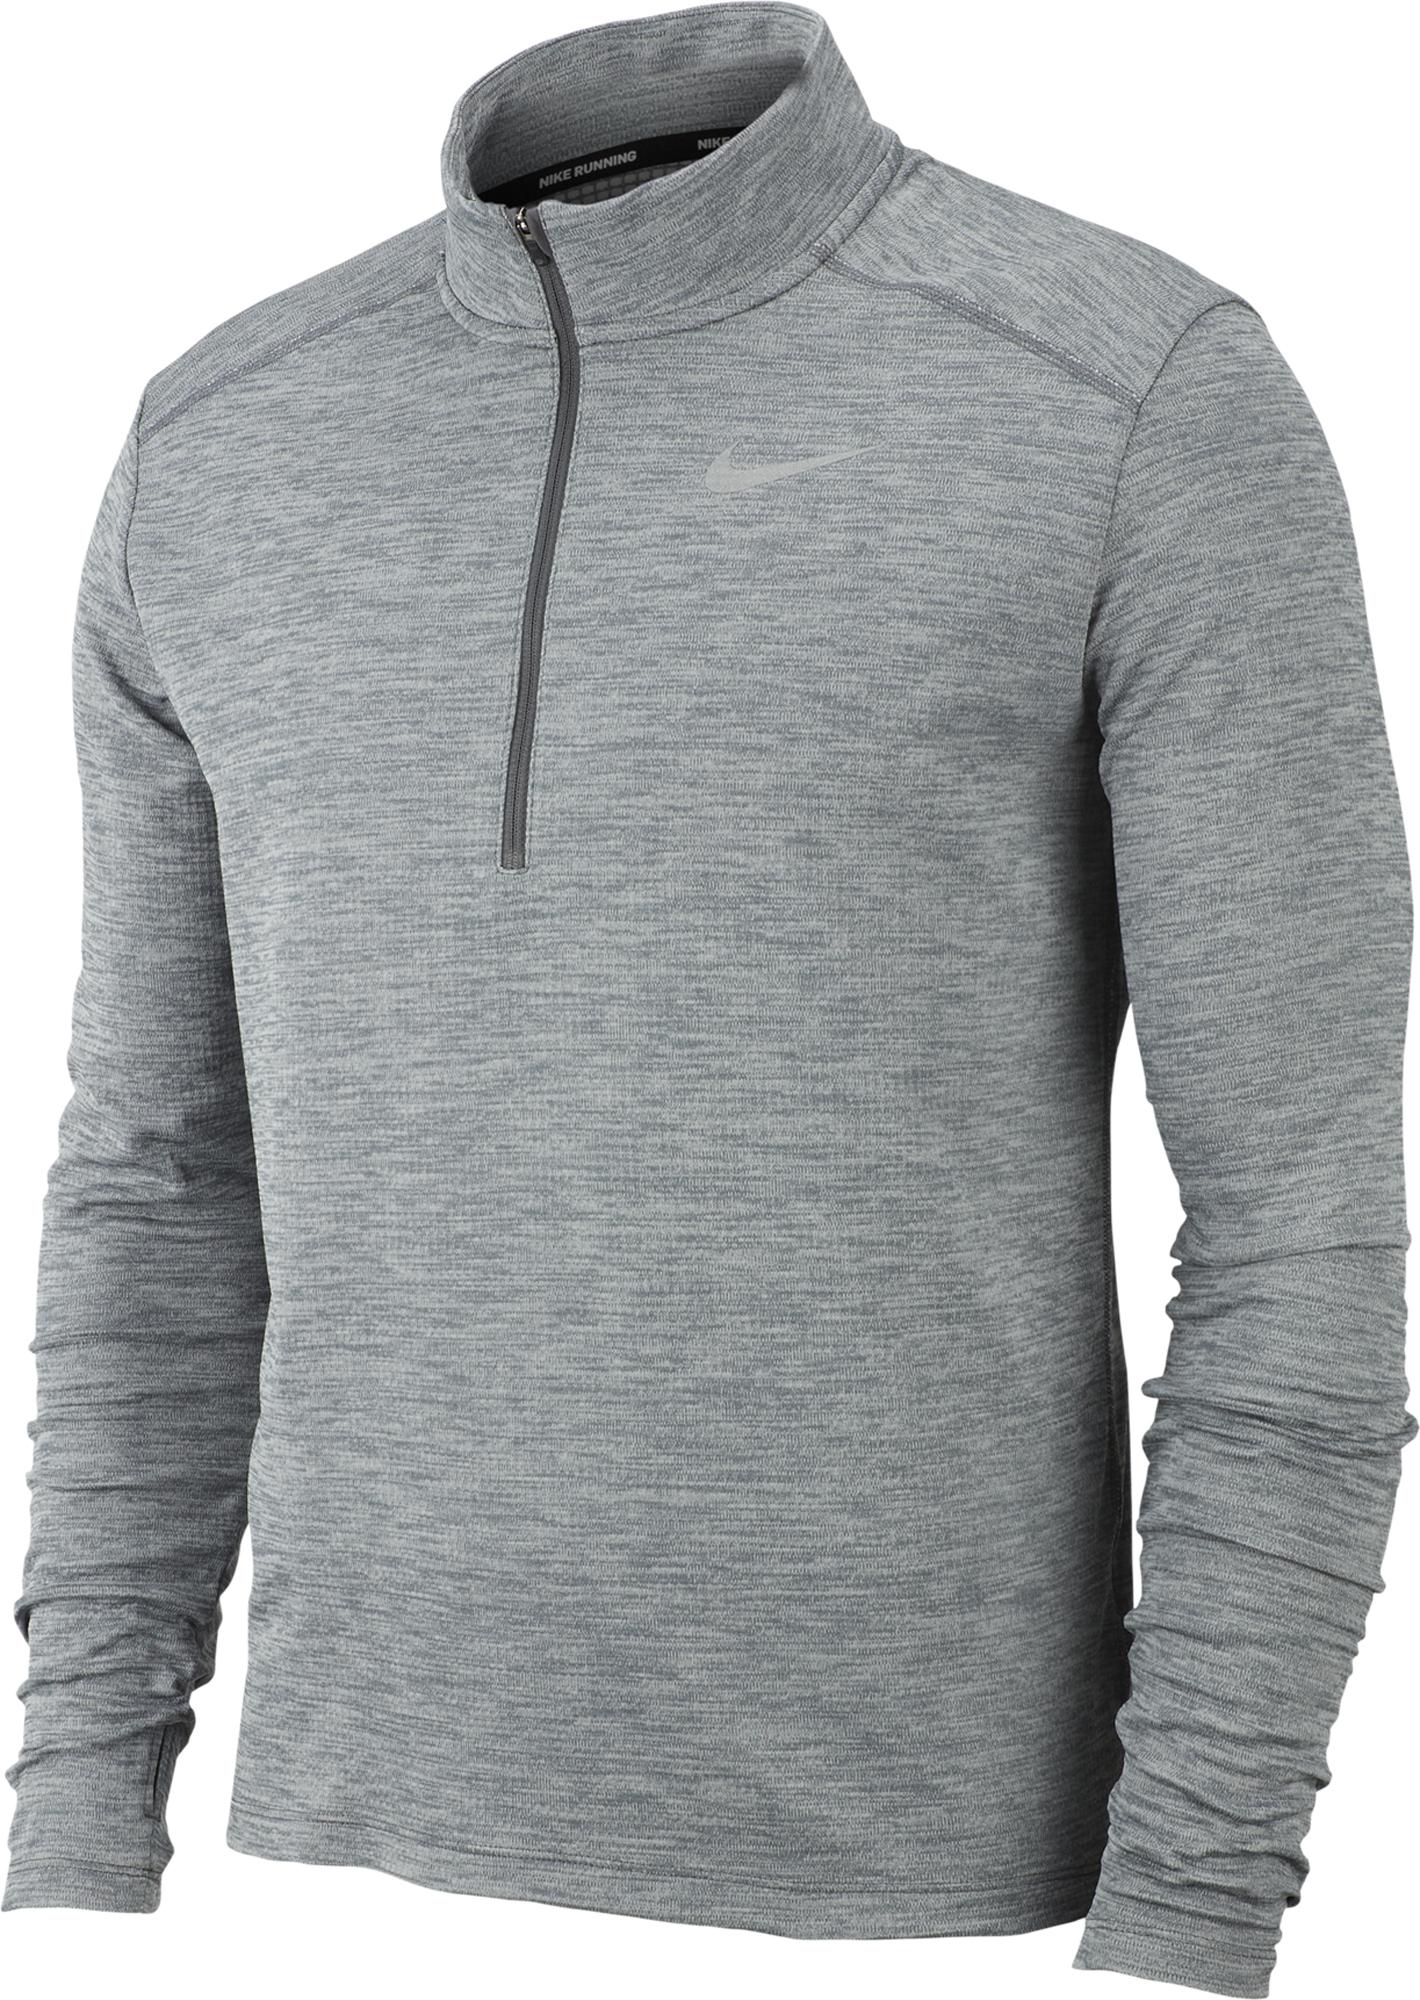 цена на Nike Олимпийка мужская Nike Pacer, размер 44-46